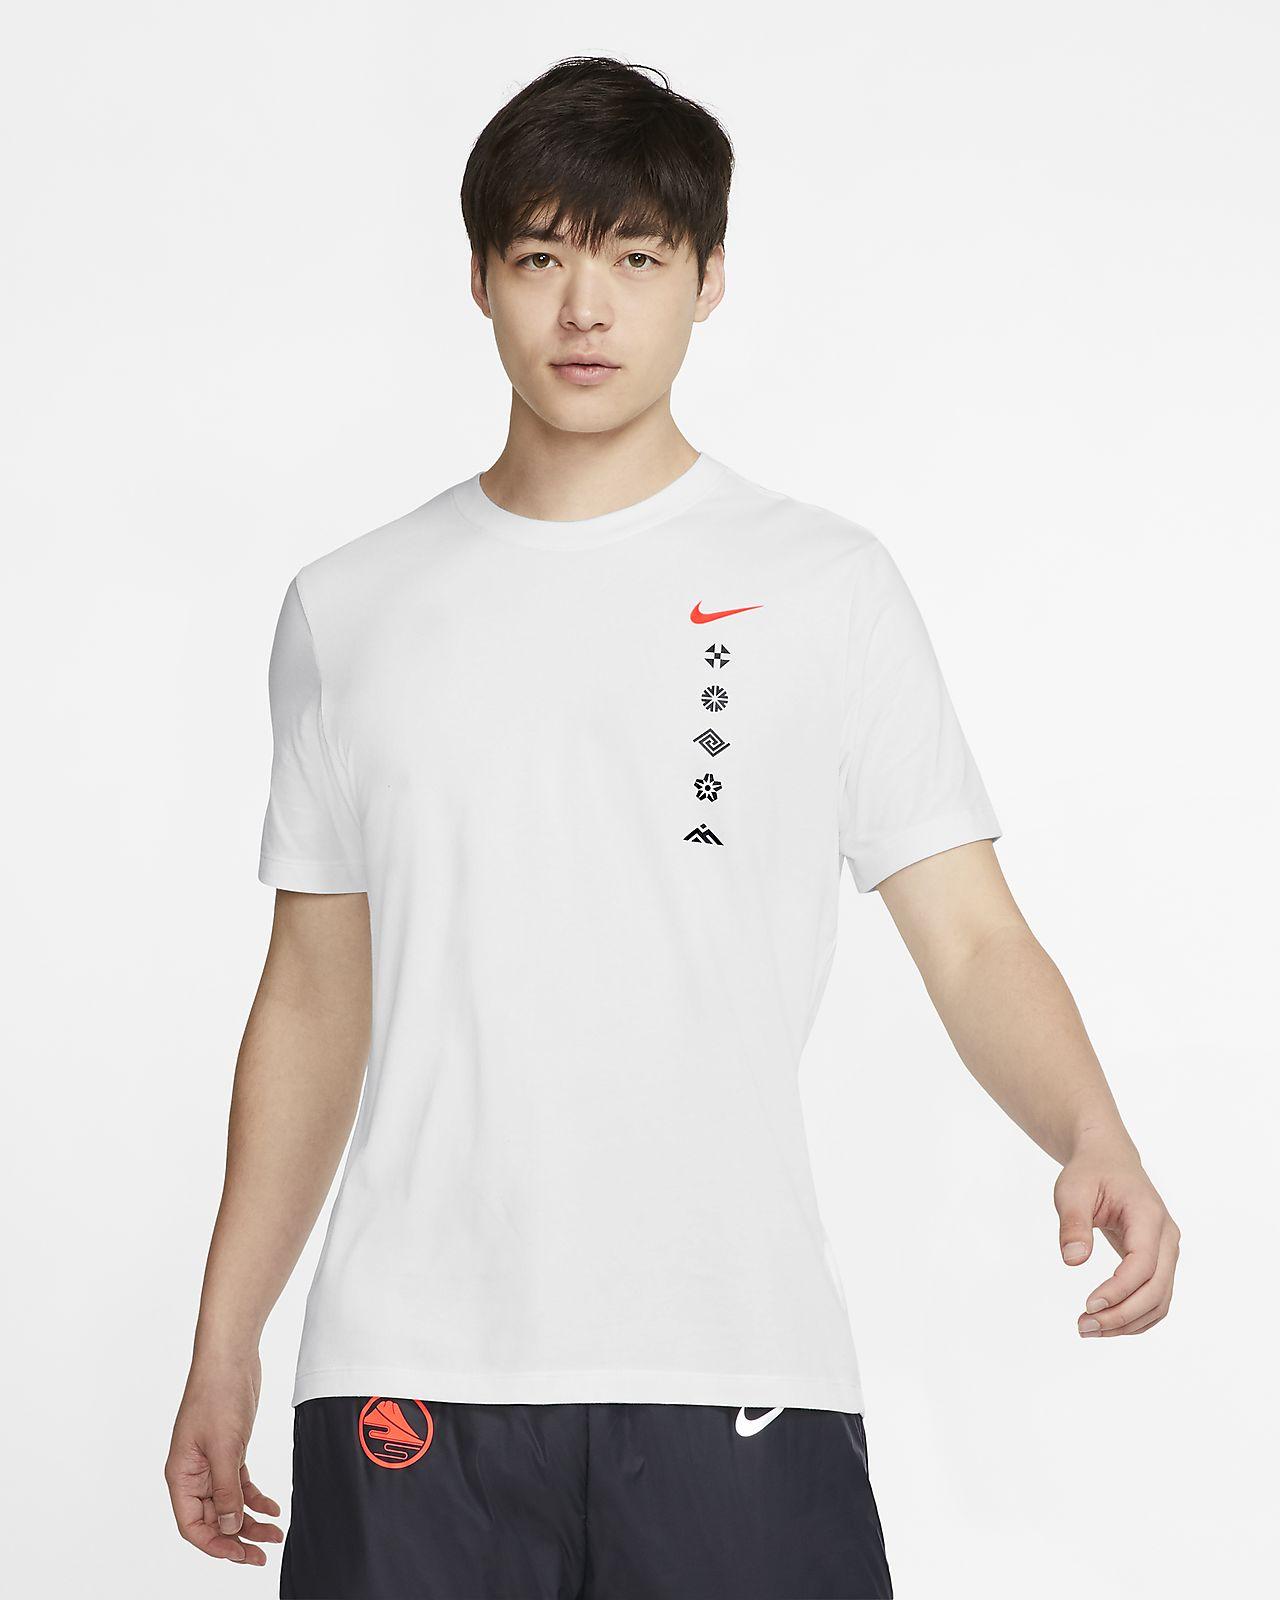 Nike Dri-FIT Hardloopshirt voor heren